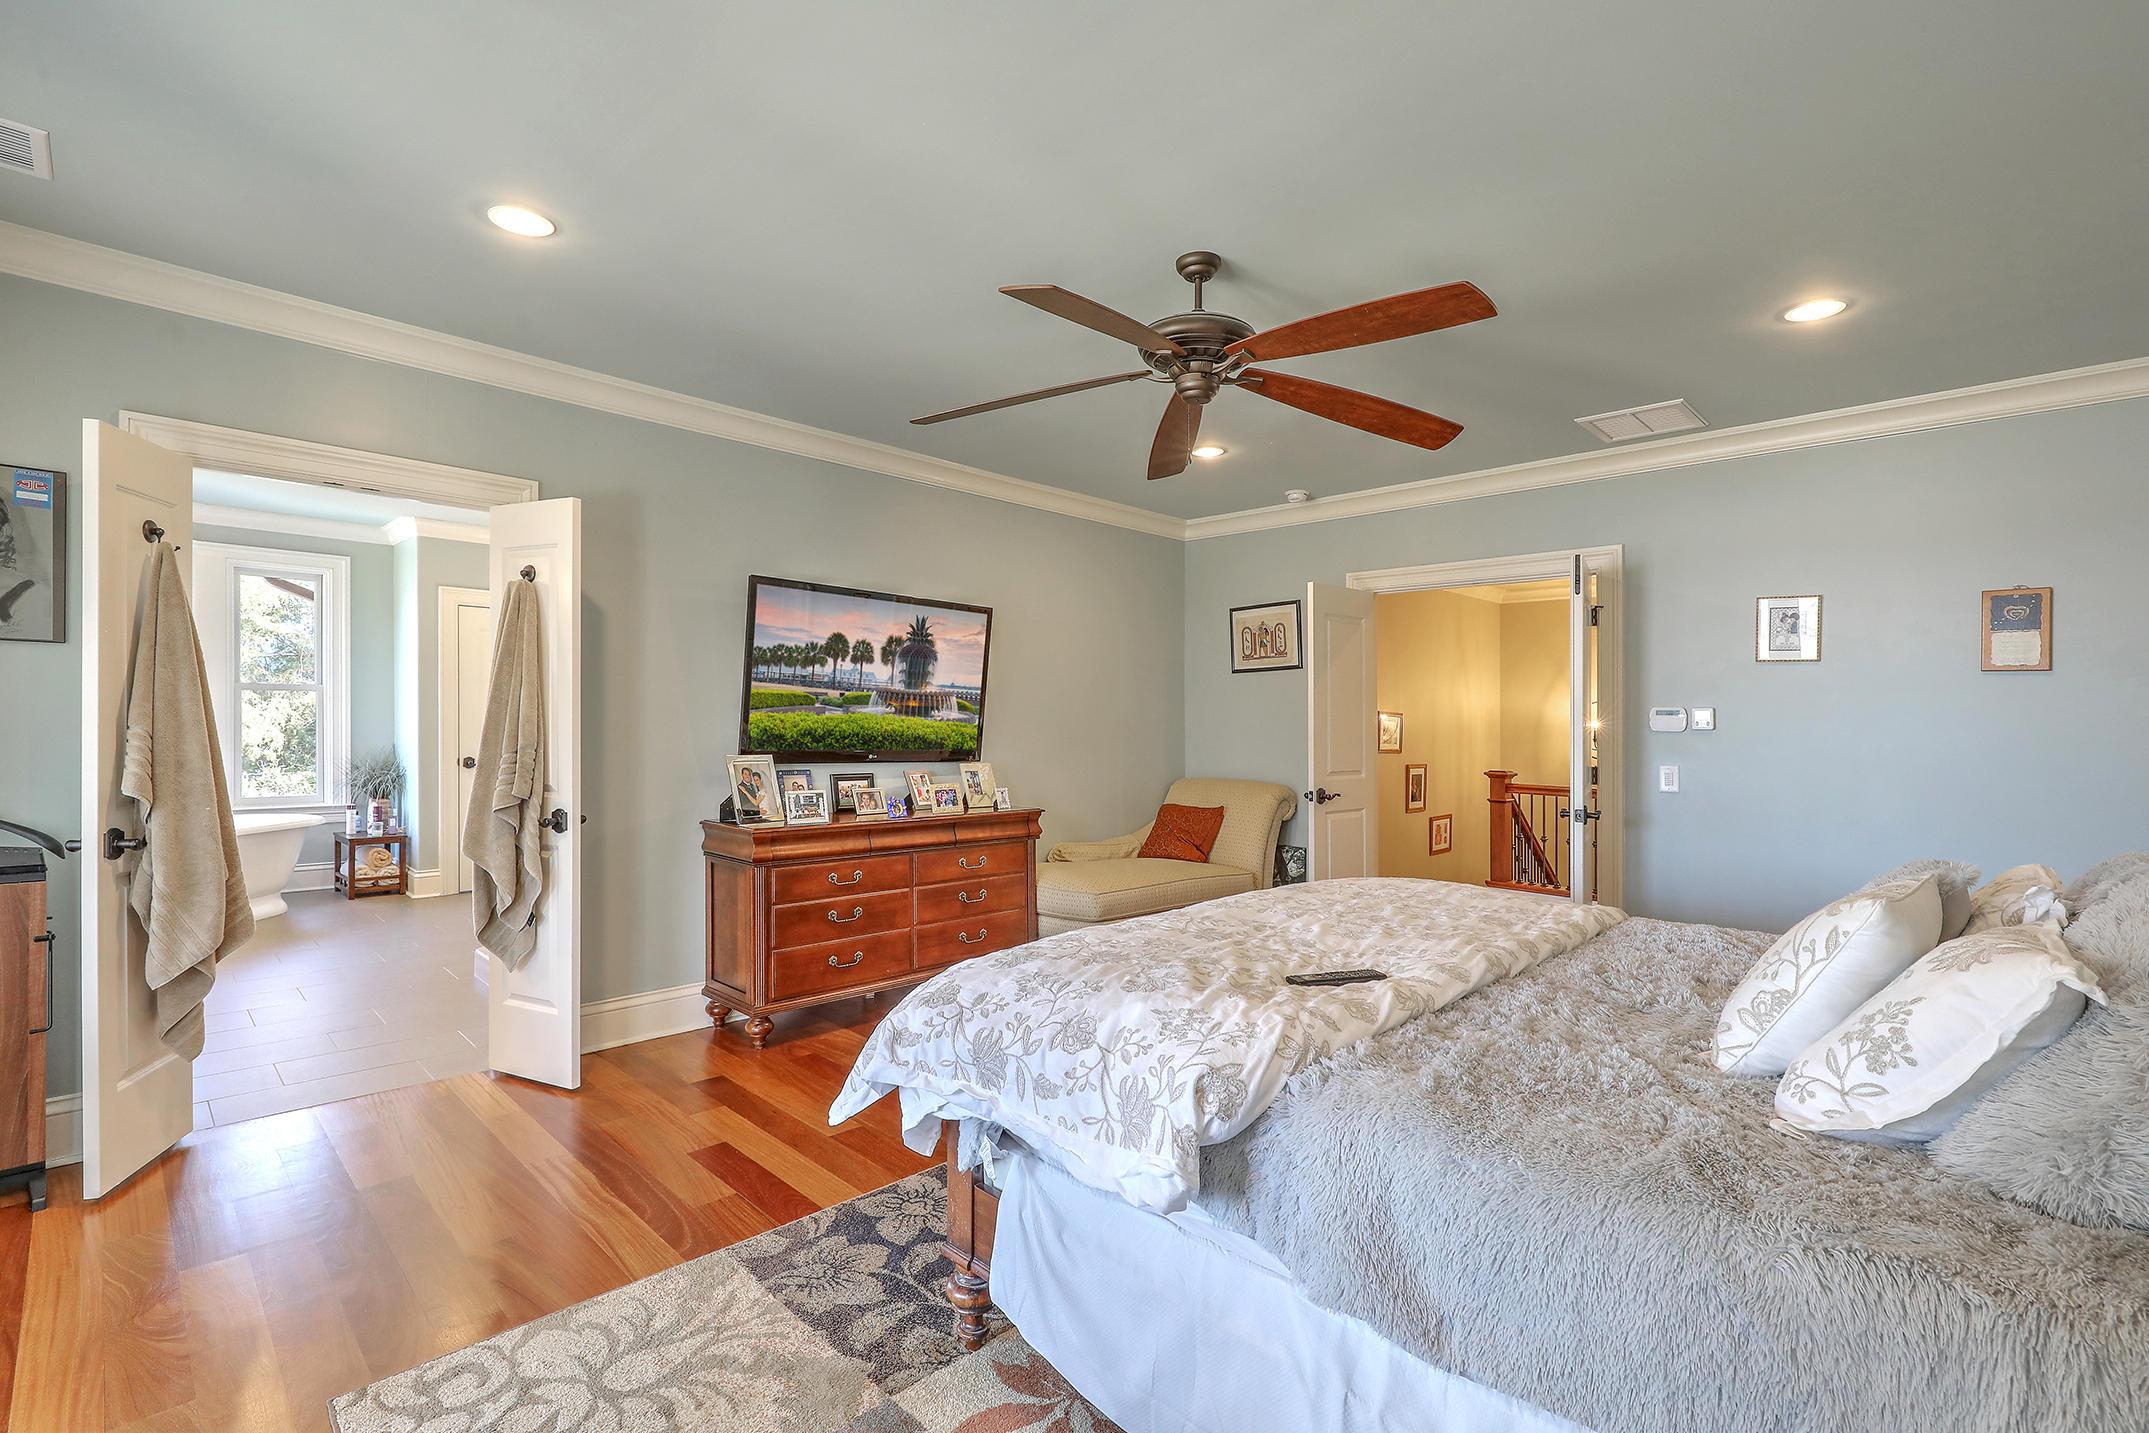 Wappoo Hall Homes For Sale - 2044 Wappoo Hall, Charleston, SC - 35